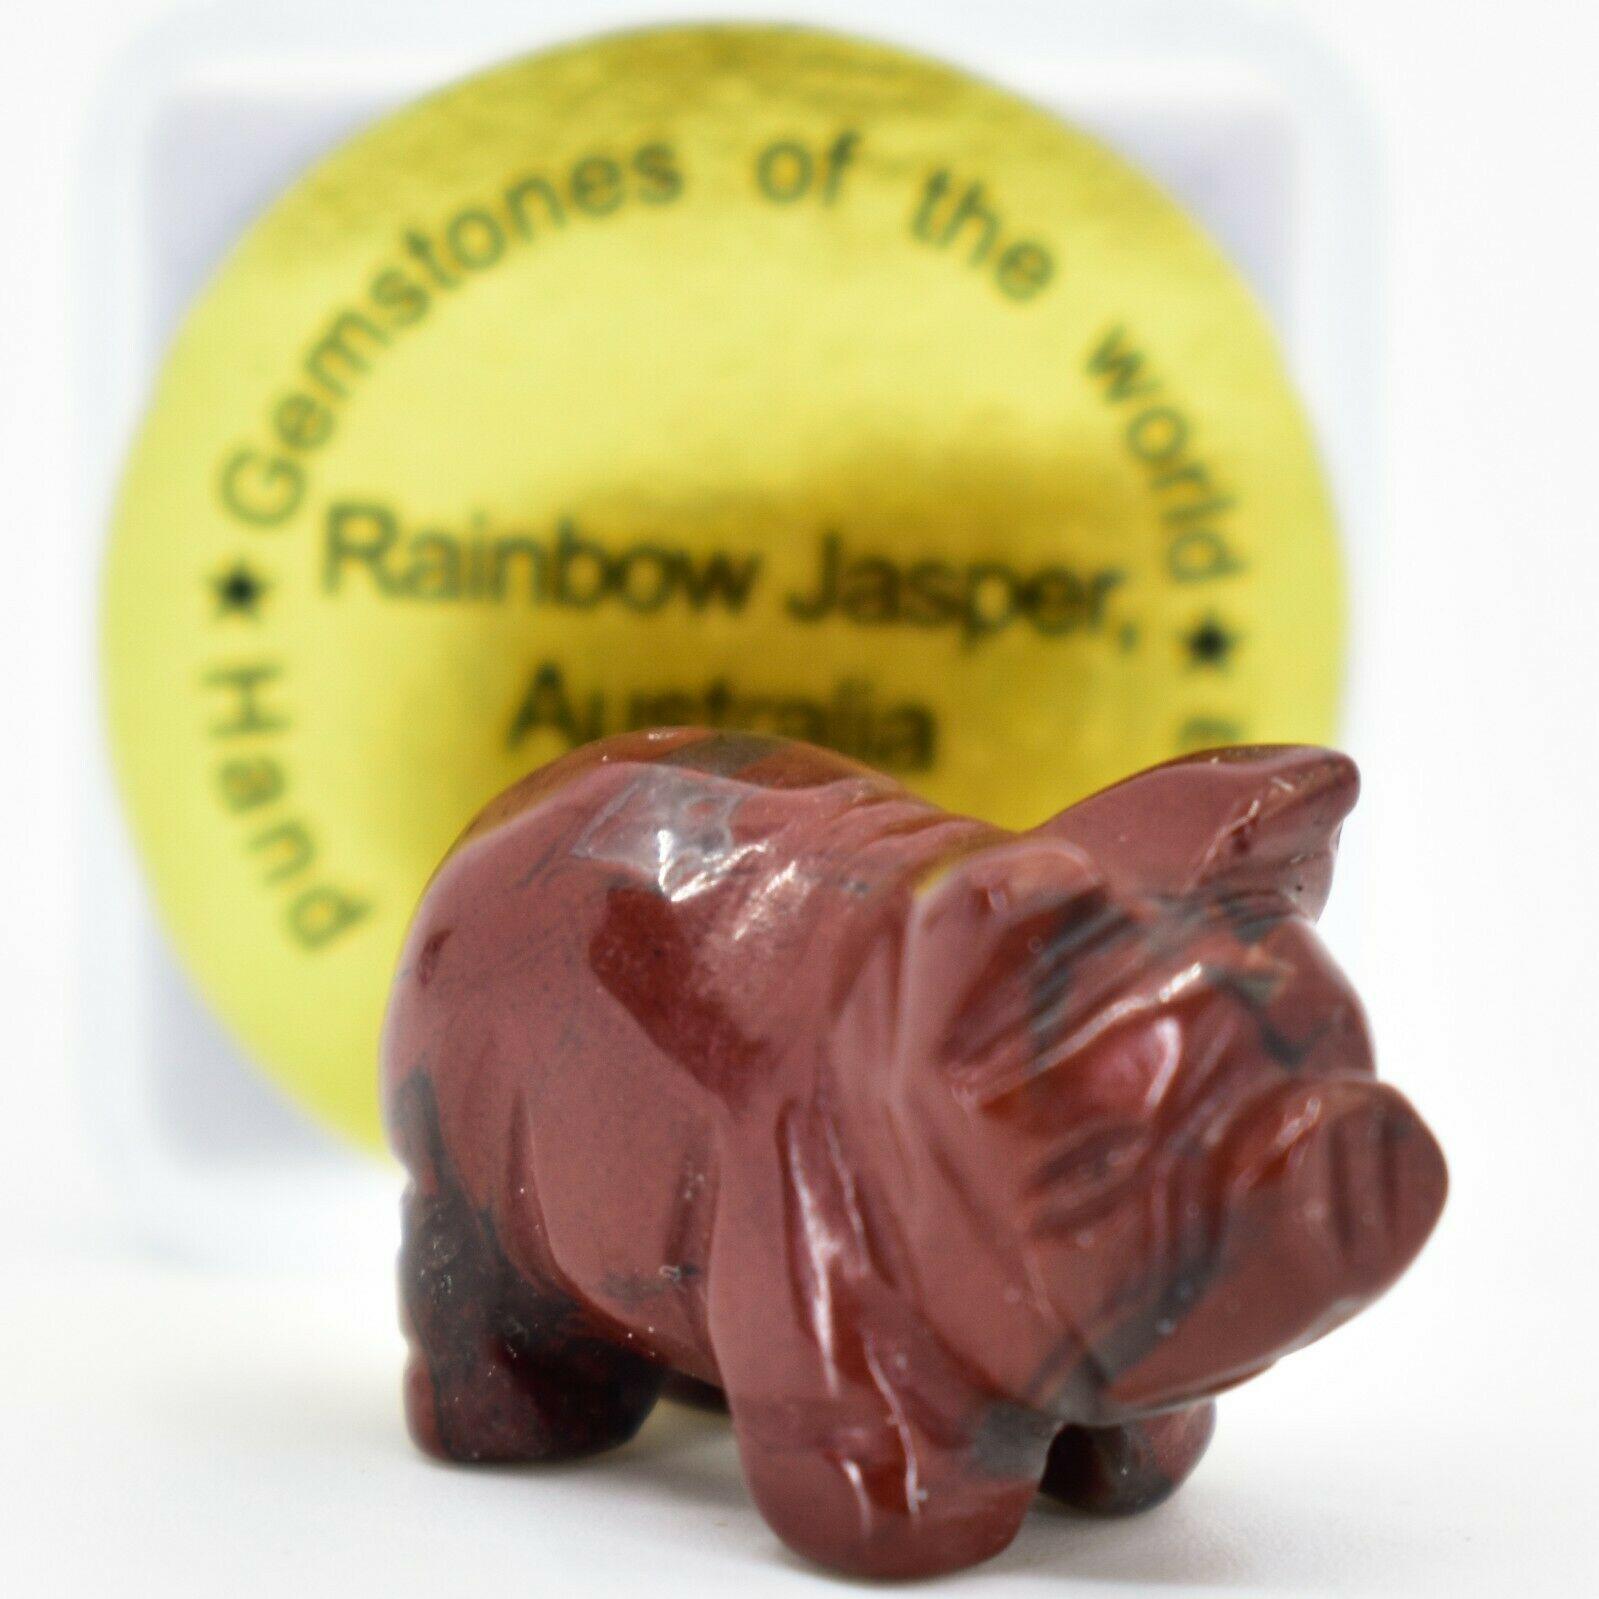 Rainbow Jasper Gemstone Tiny Miniature Pig Hand Carved Stone Figurine